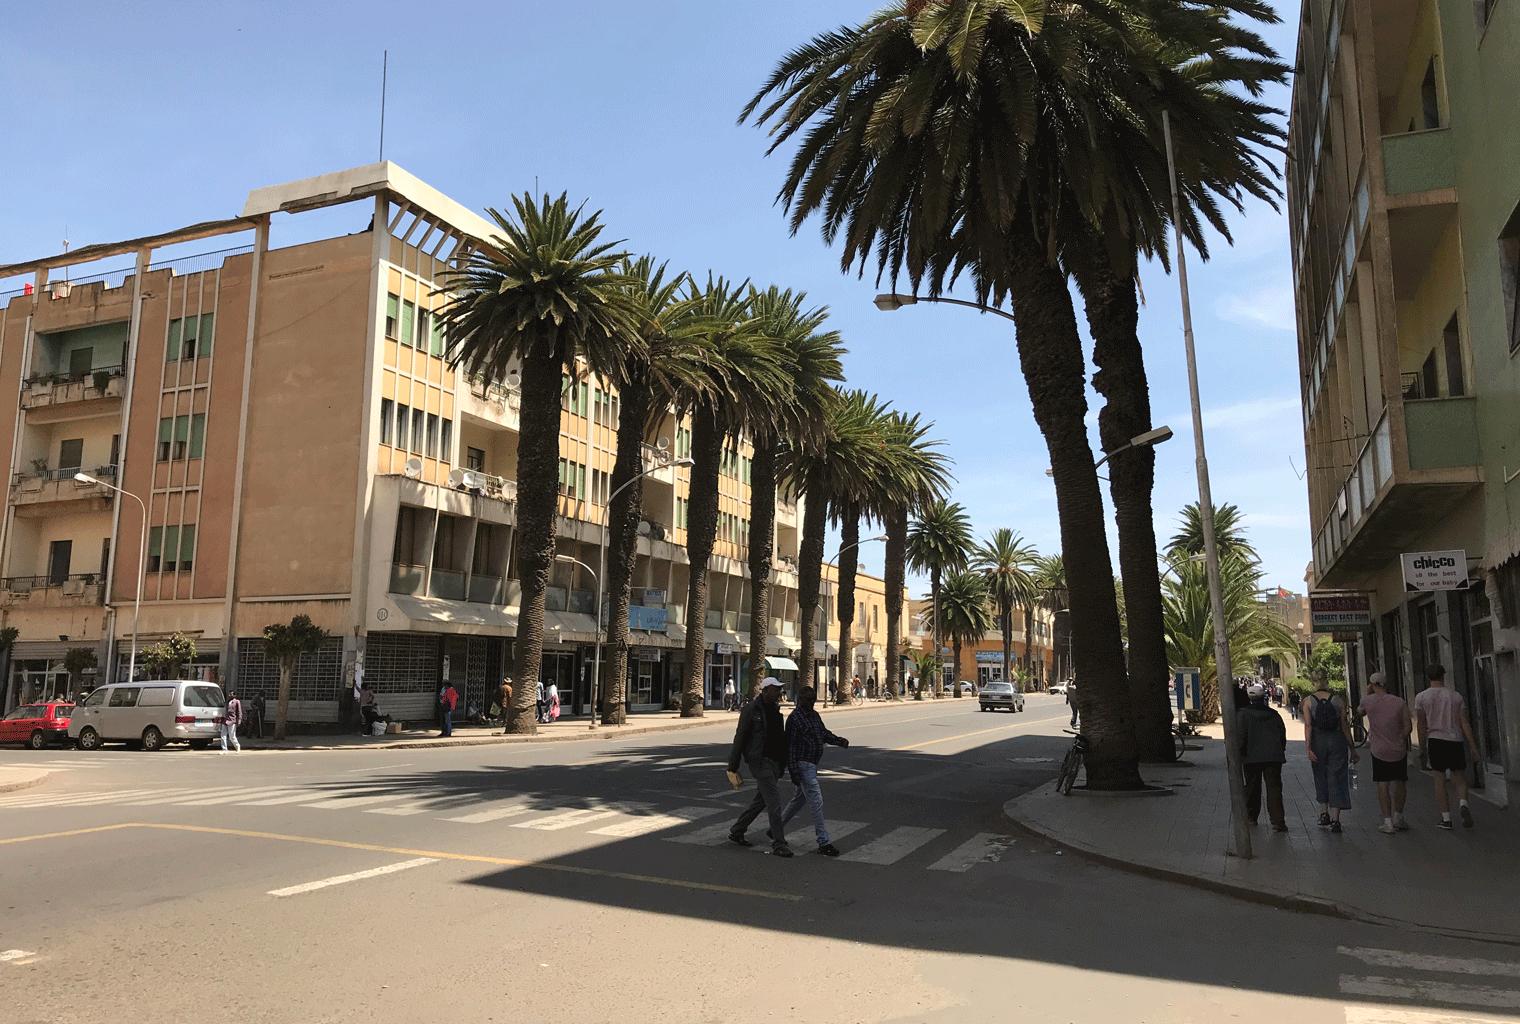 Eritrea-Asmara-City